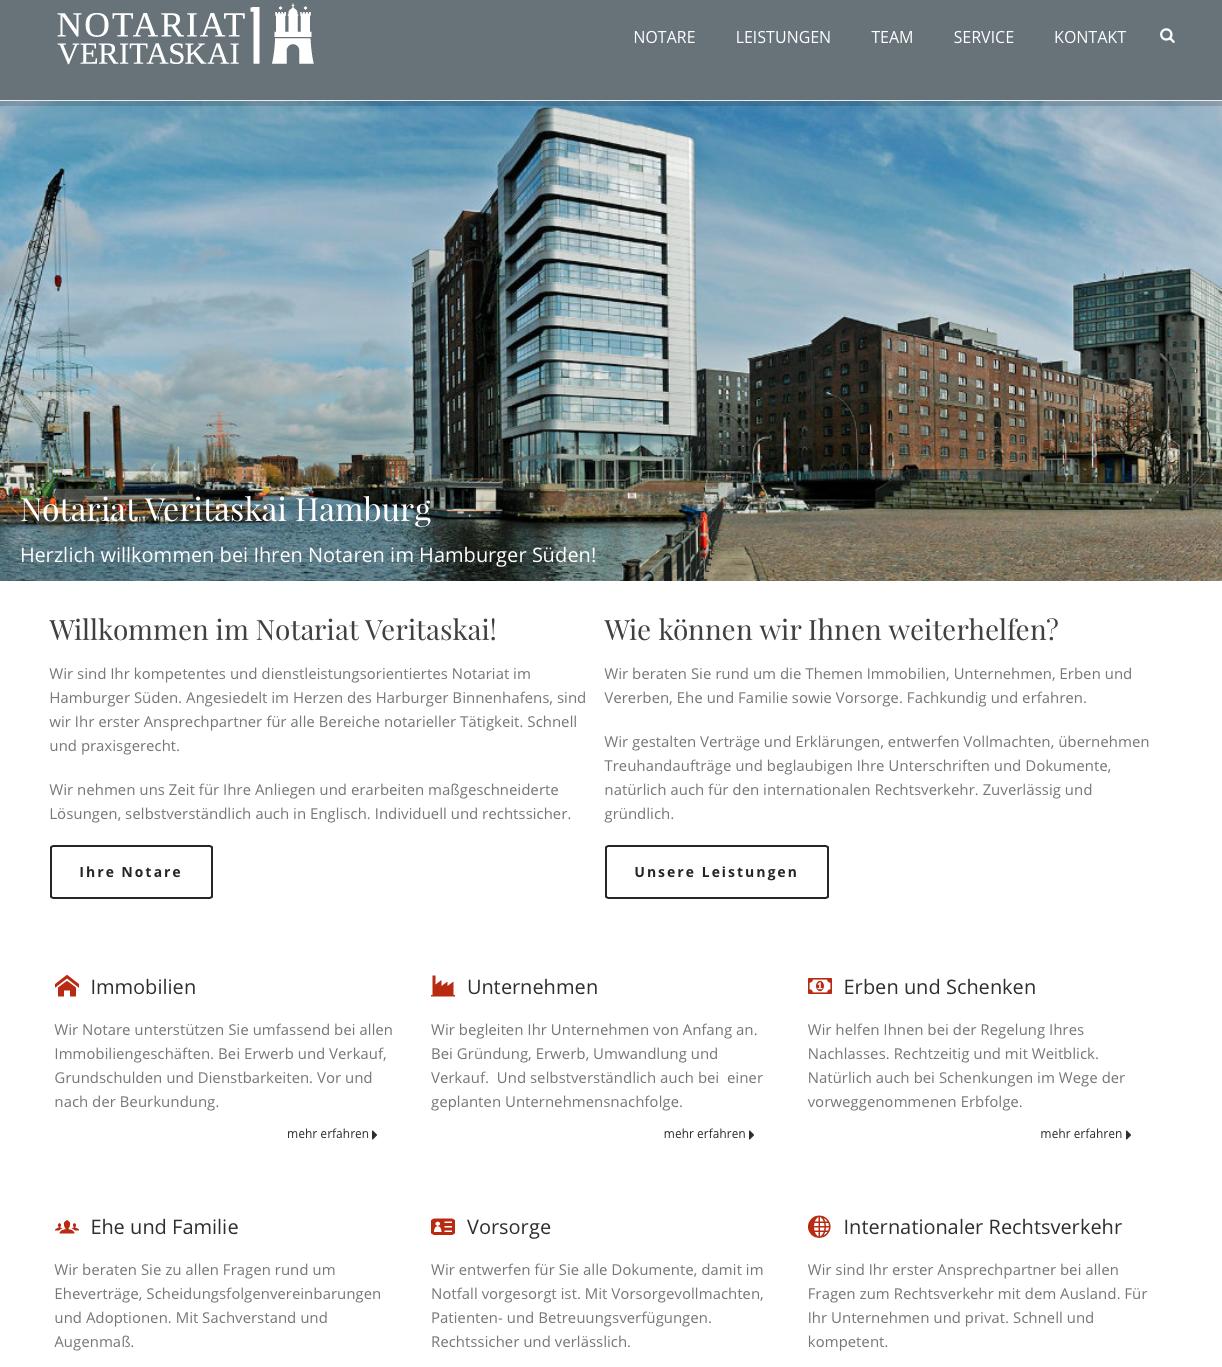 Notariat Veritaskai Hamburg